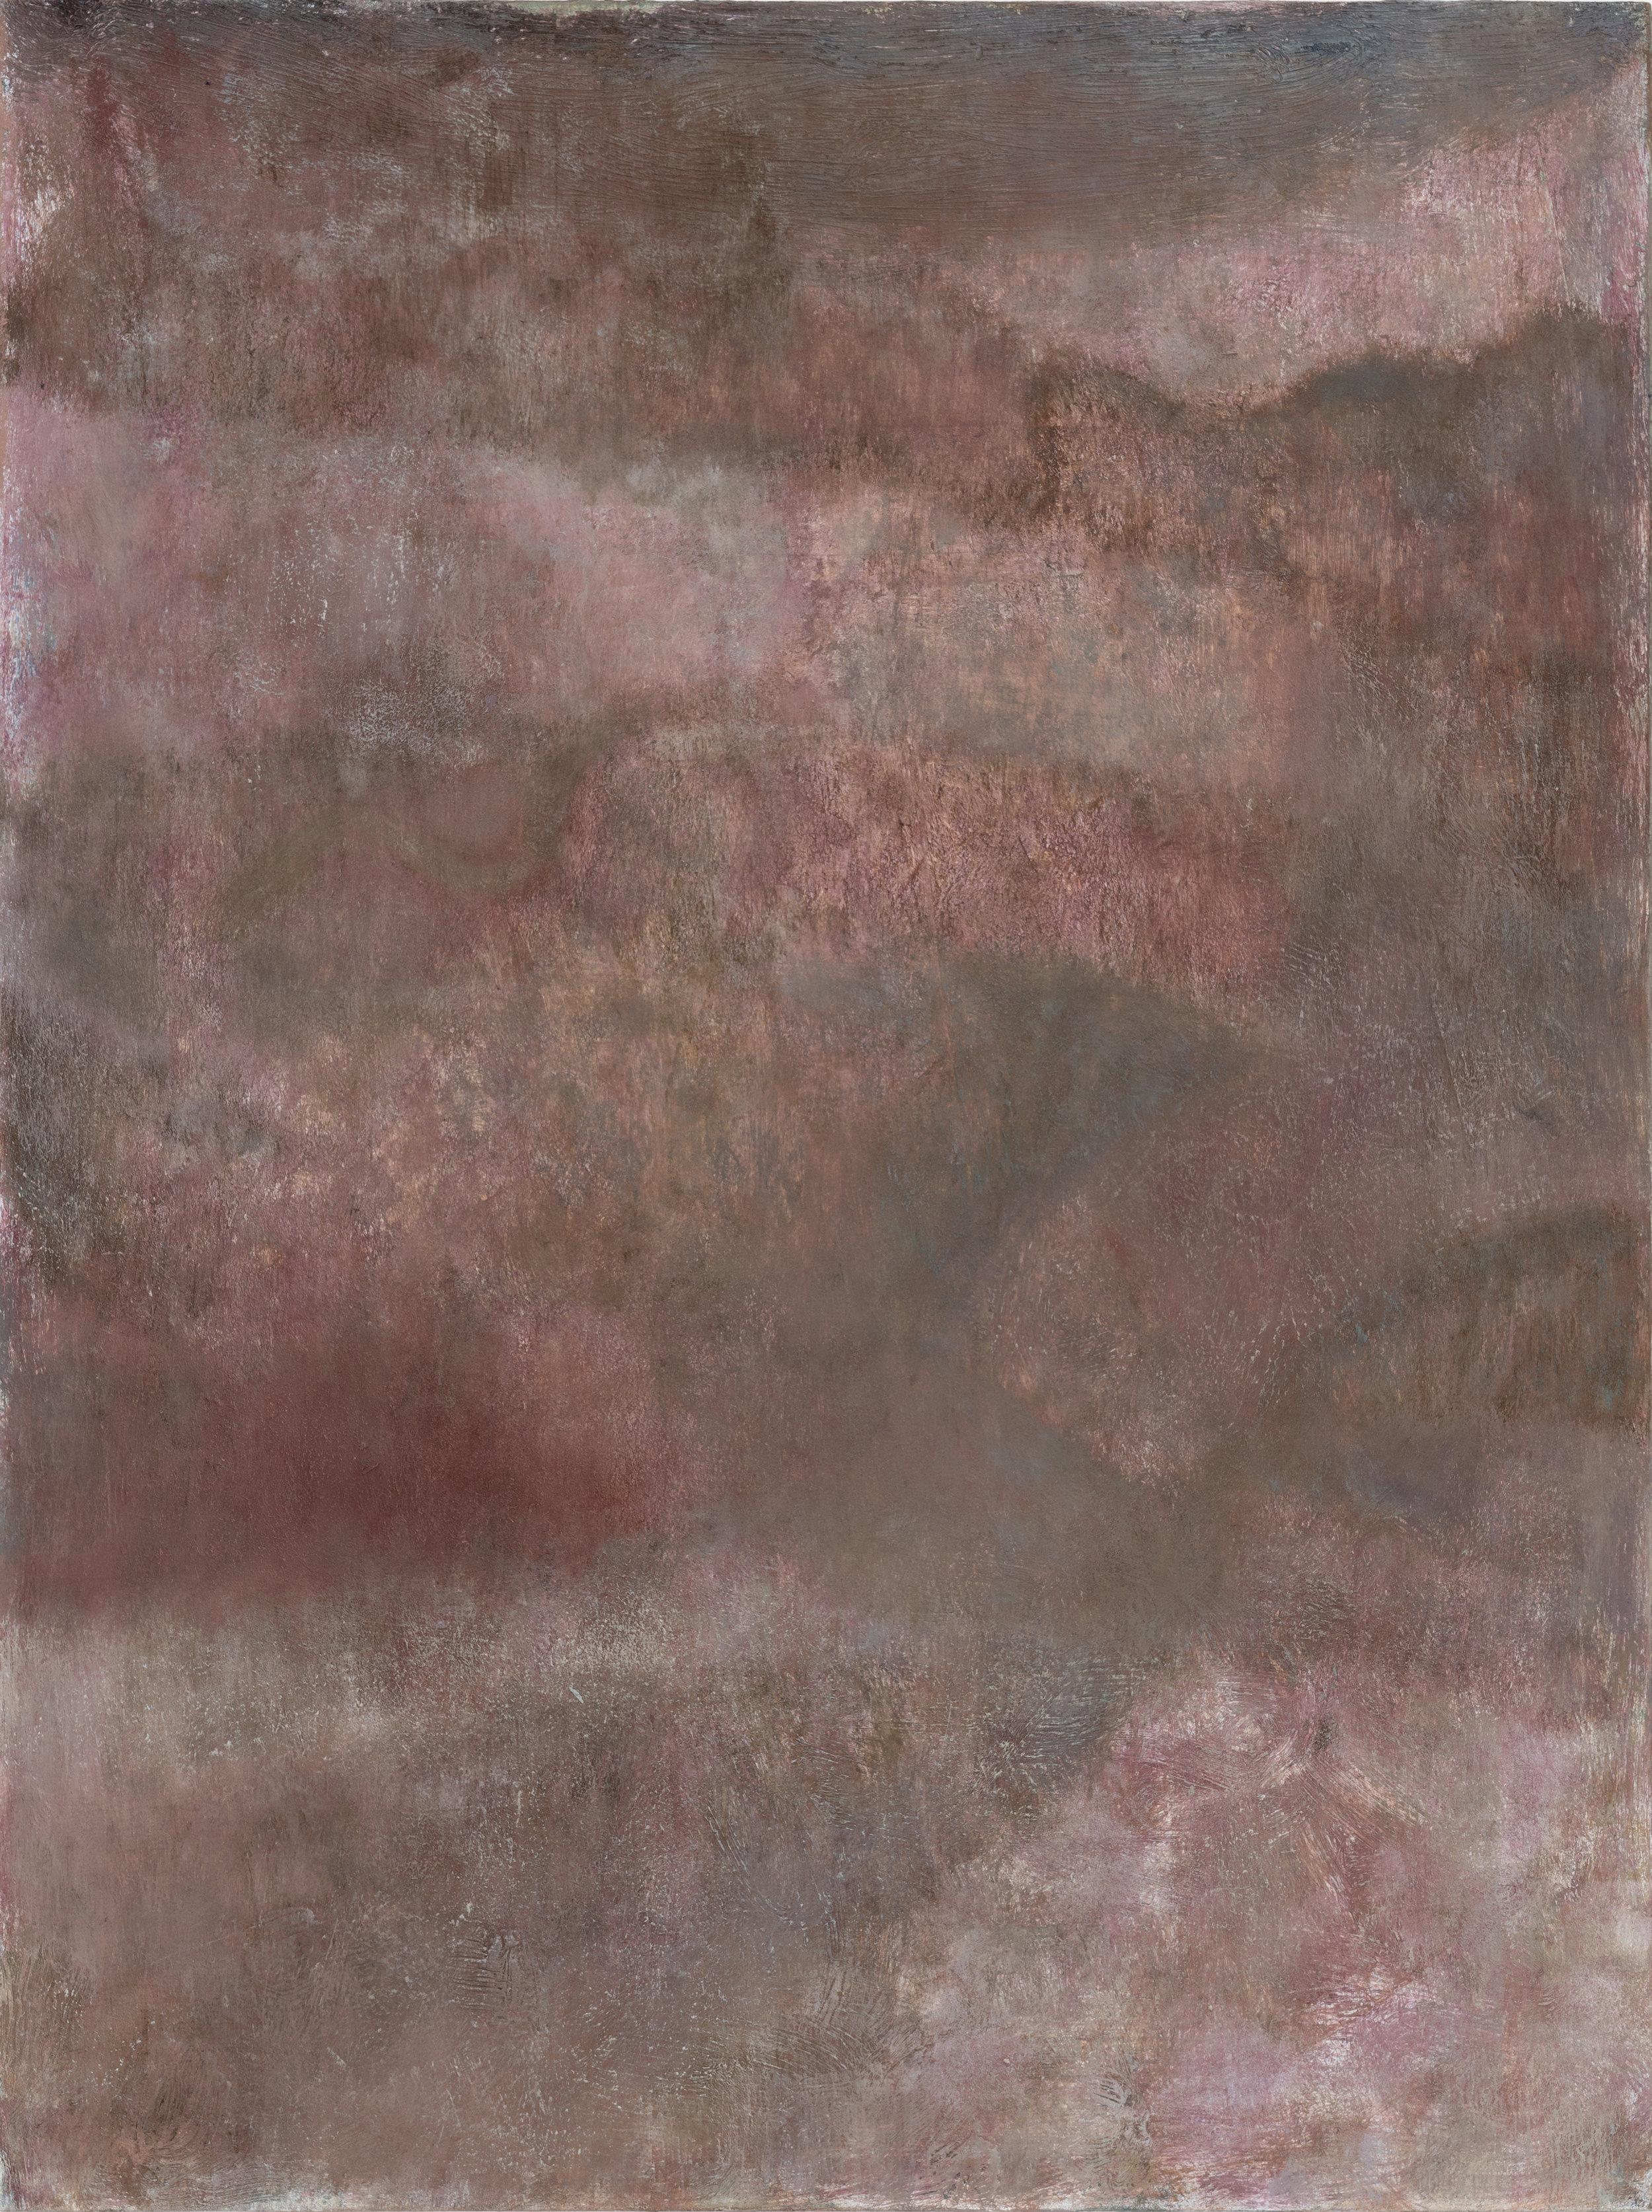 "Laurence Pilon,  Smoky Fog,  2018, oil on panel, 16"" x 12"" (41 x 30 cm)"